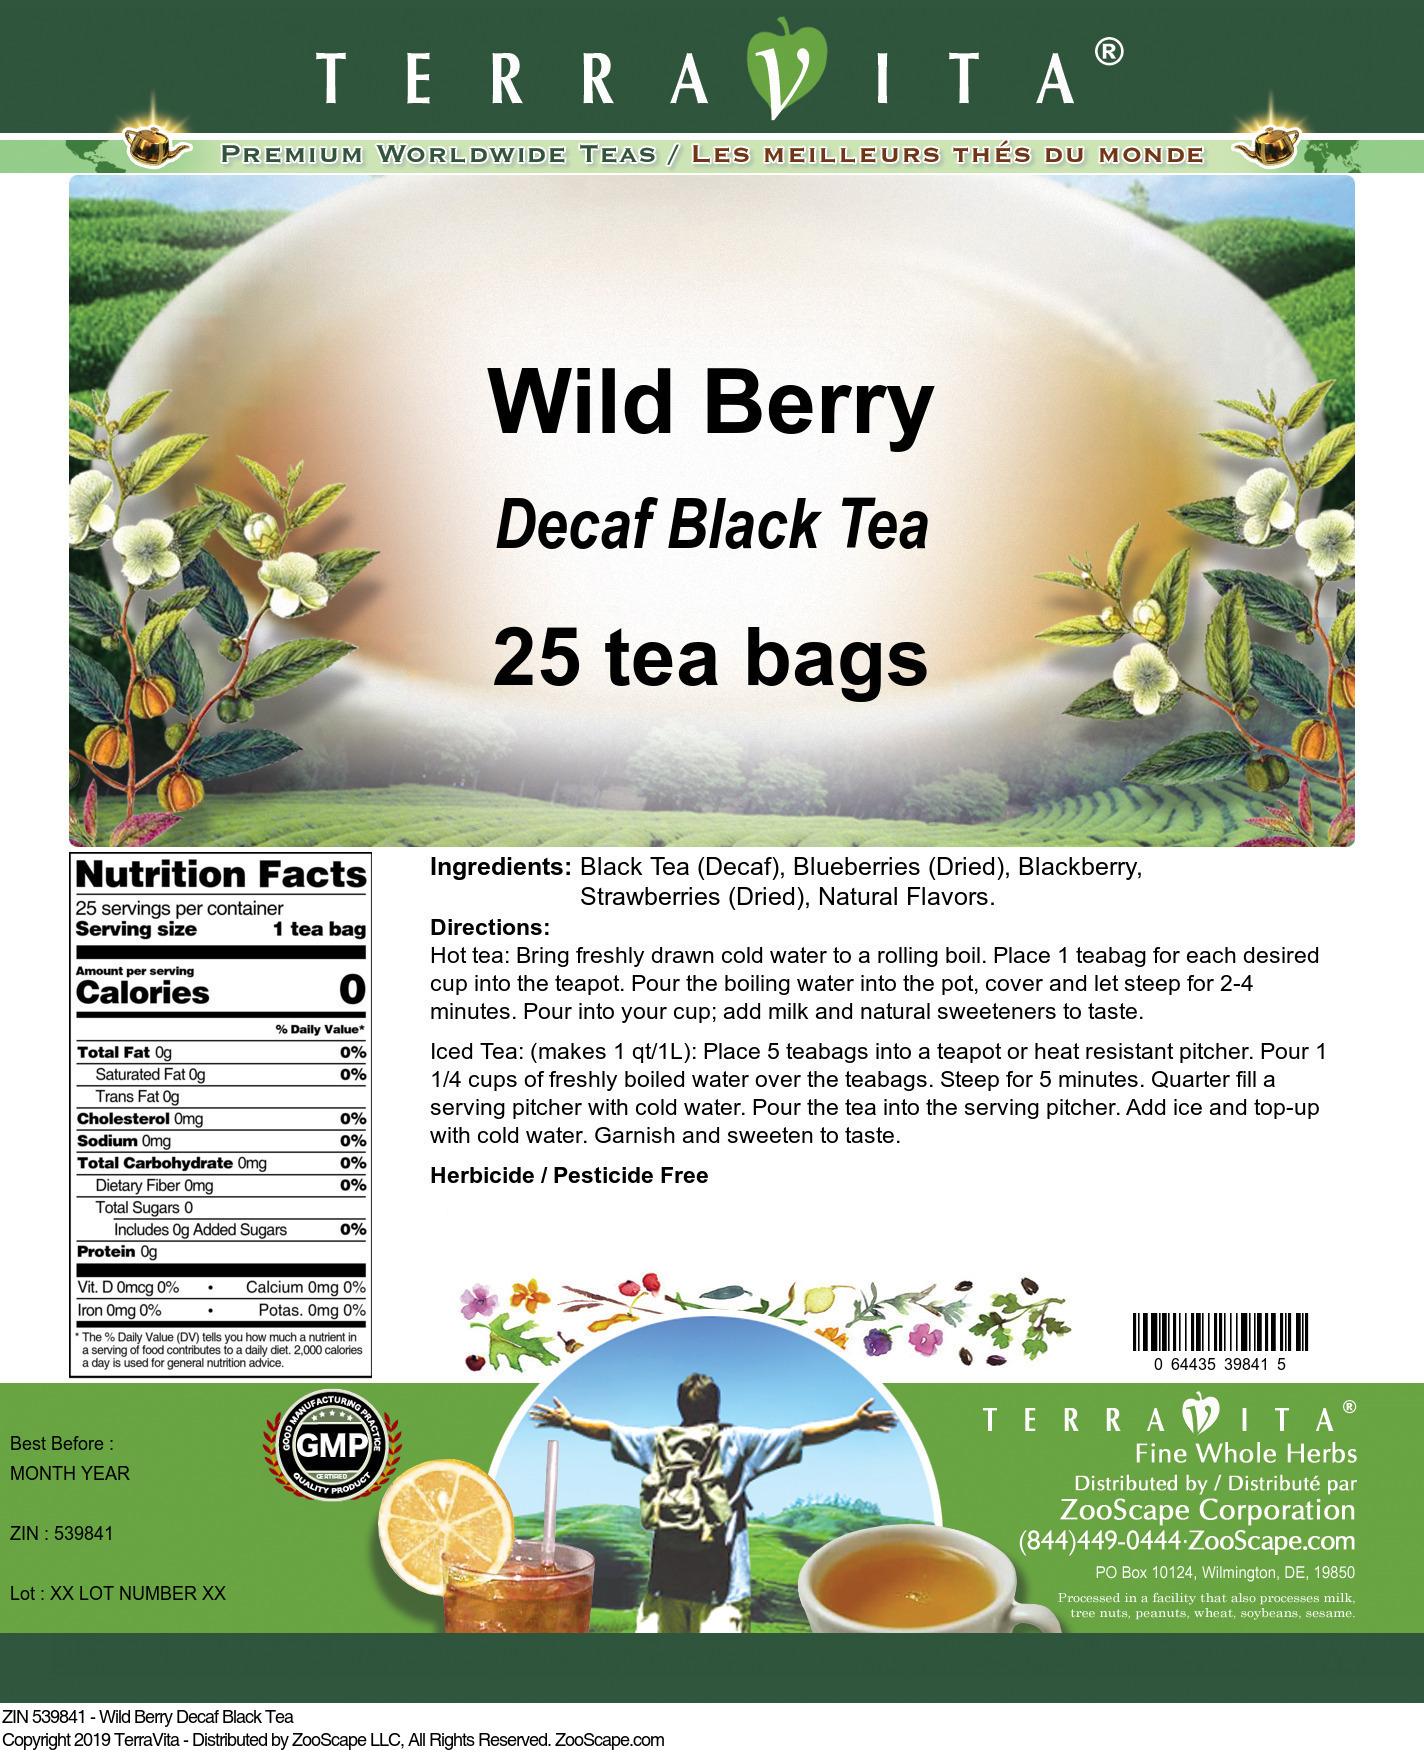 Wild Berry Decaf Black Tea